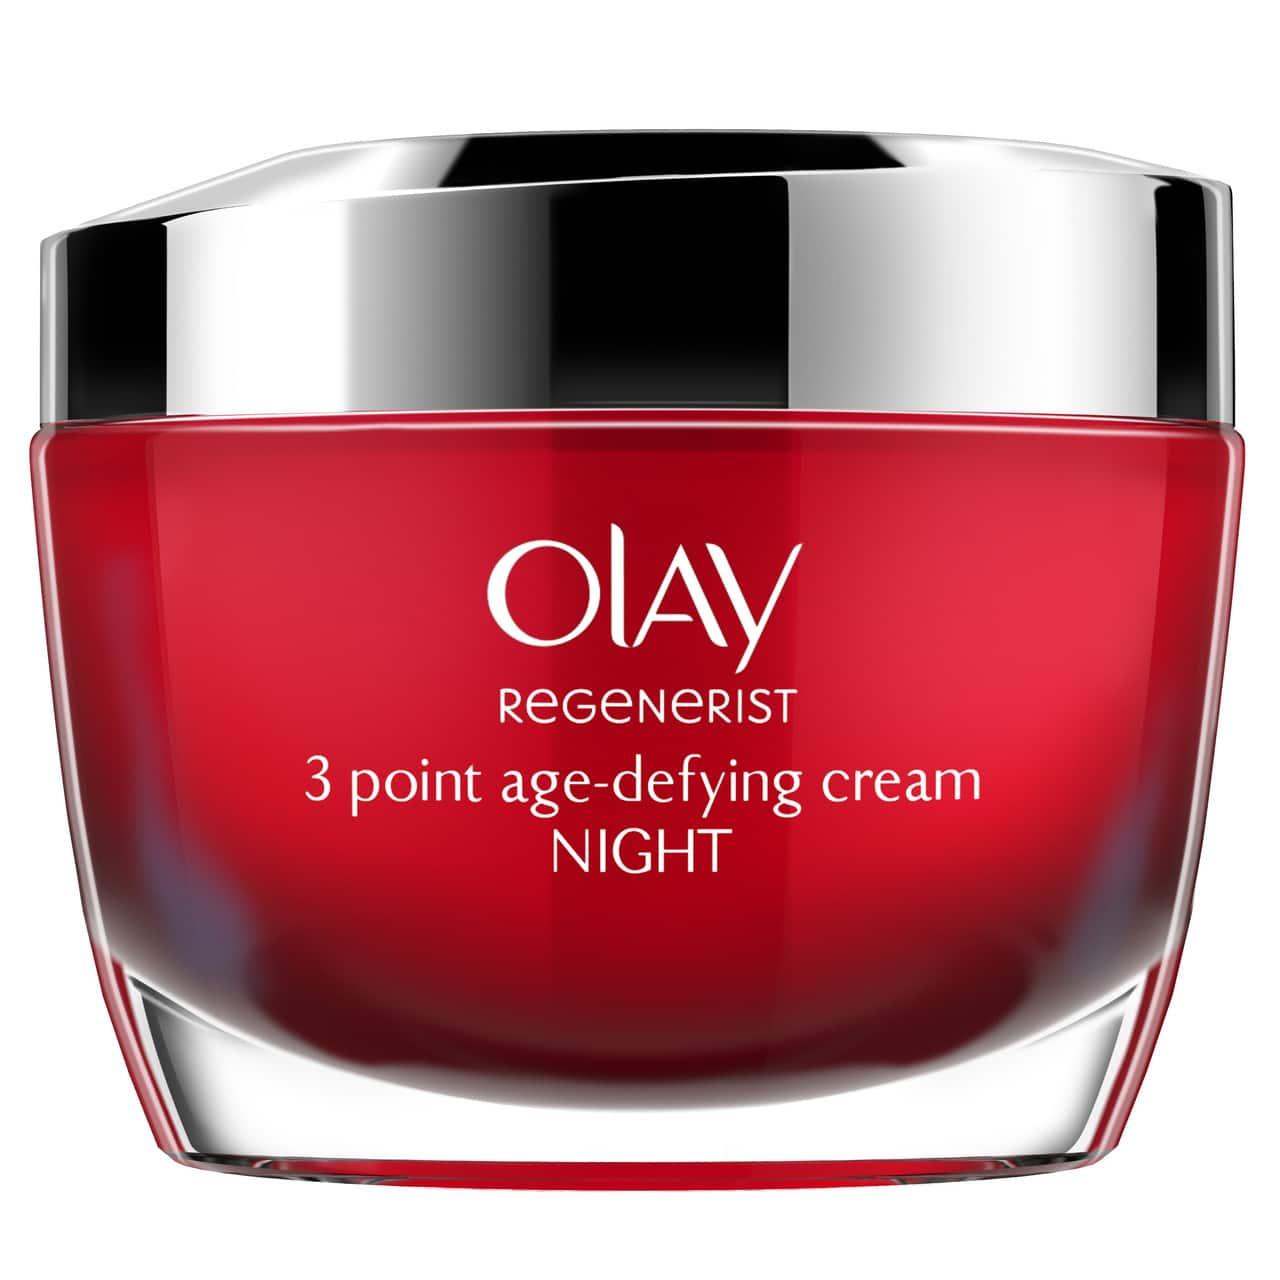 OLAY Regenerist 3PT Night Treatment Cream 50ml